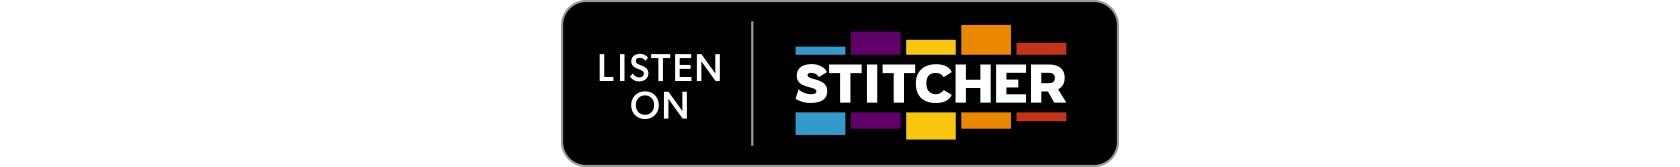 podcast platforms stitcher